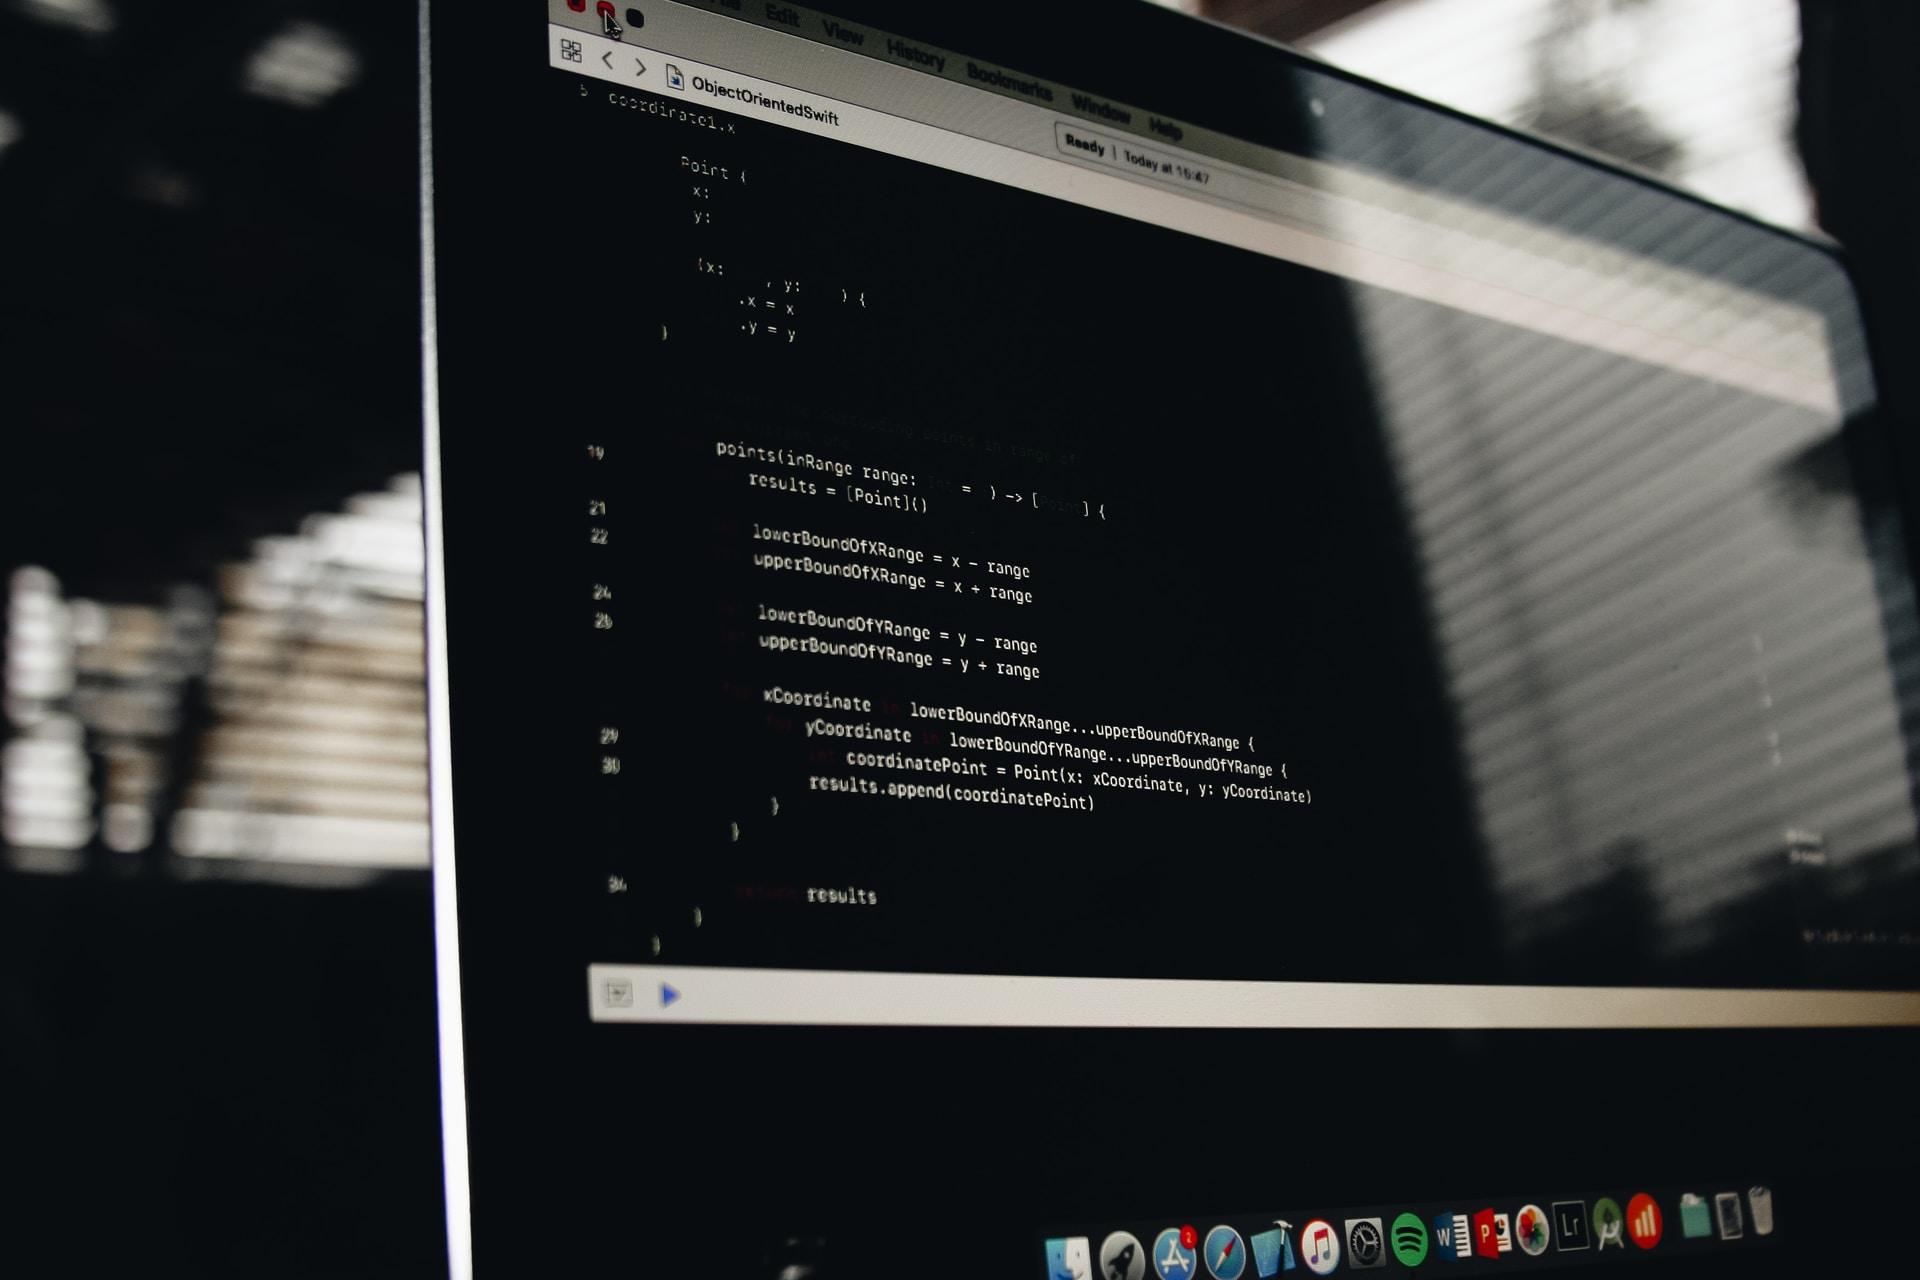 Tuning Input/Output (I/O) Operations for PostgreSQL